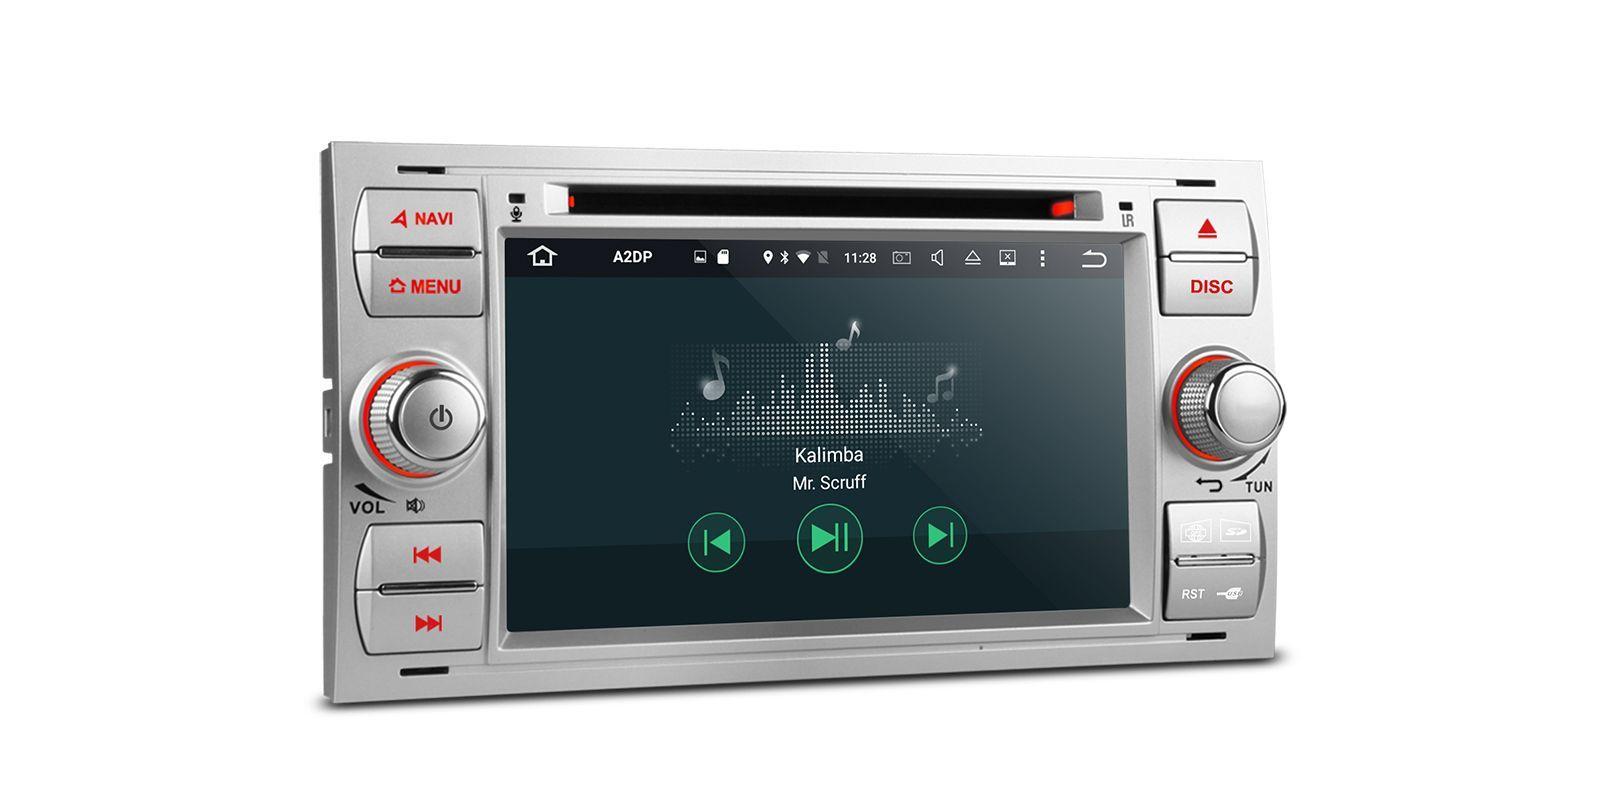 ford headunit 7 radio dvd gps android 6 0 2gb ram. Black Bedroom Furniture Sets. Home Design Ideas